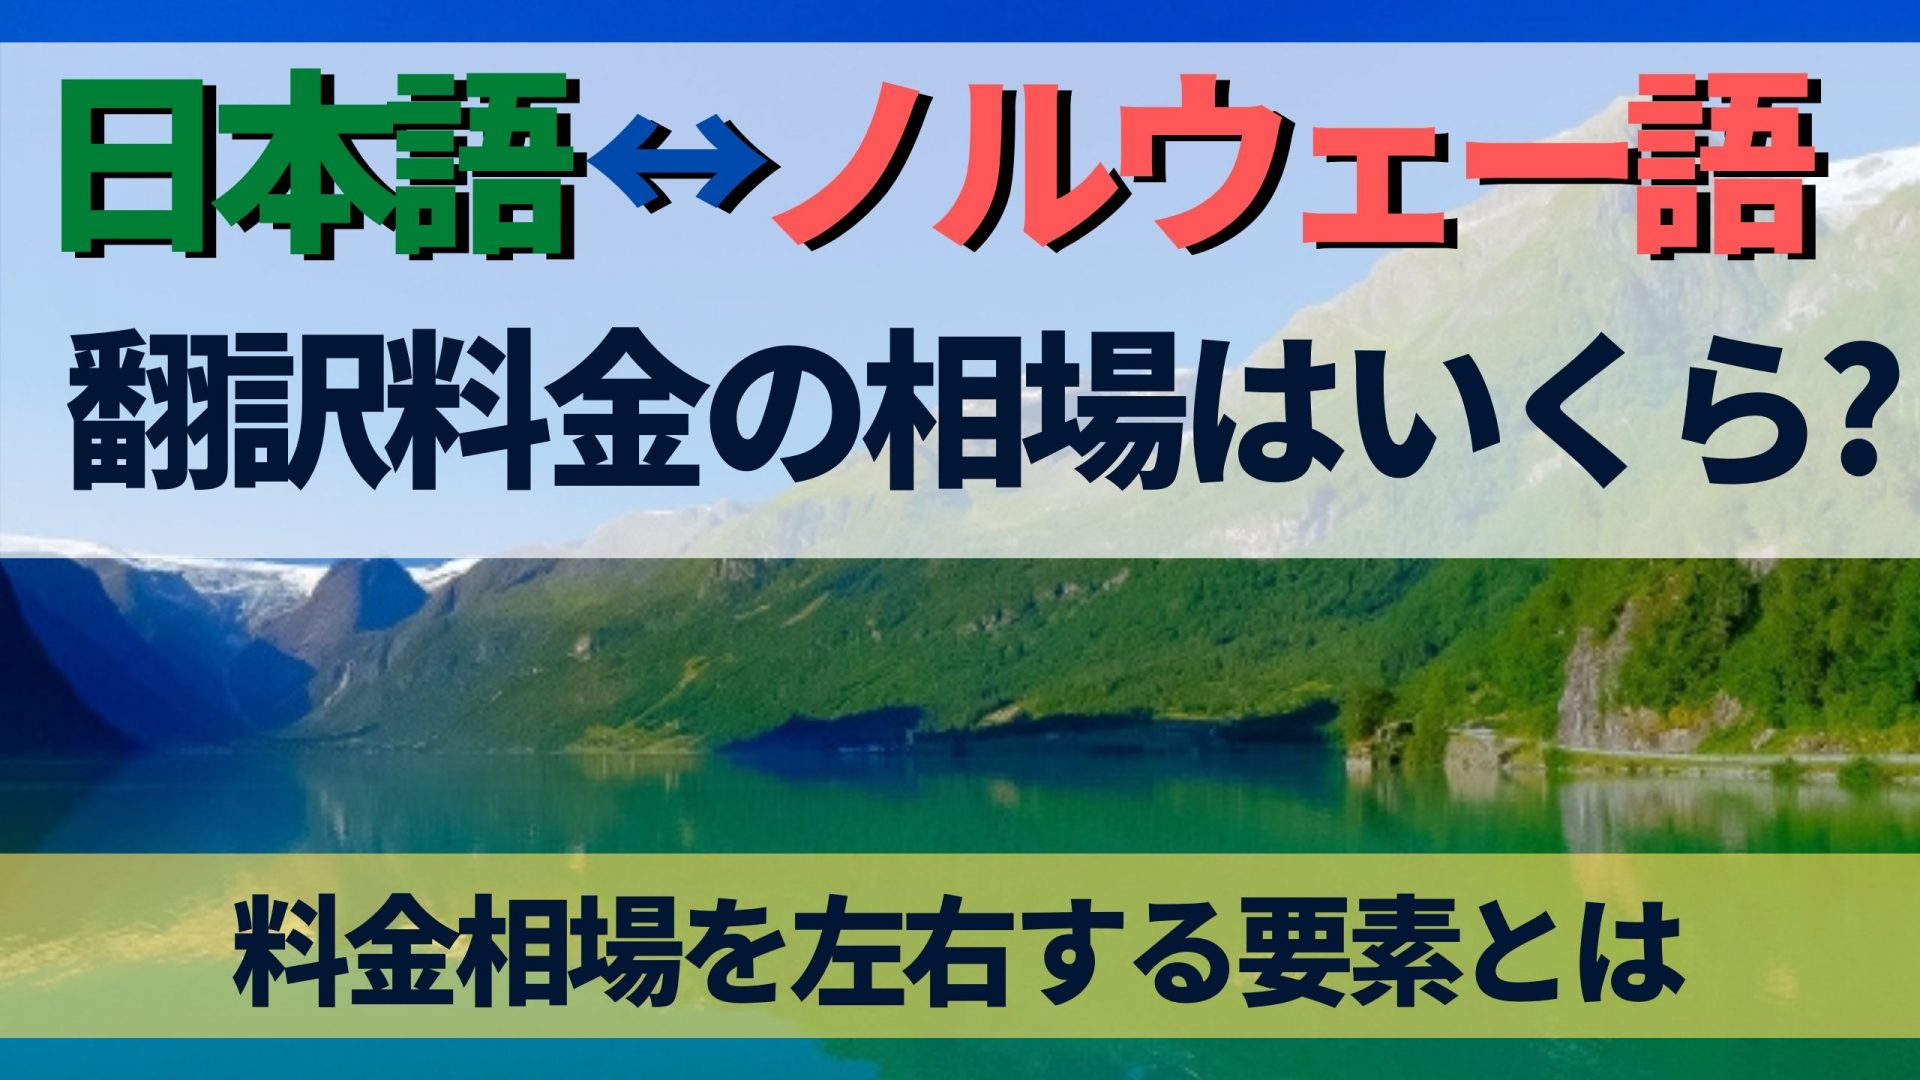 9012cd77f3b5f6c9de3da6bf53e121dd - 日本語・ノルウェー語間の翻訳の料金相場・単価はいくら?